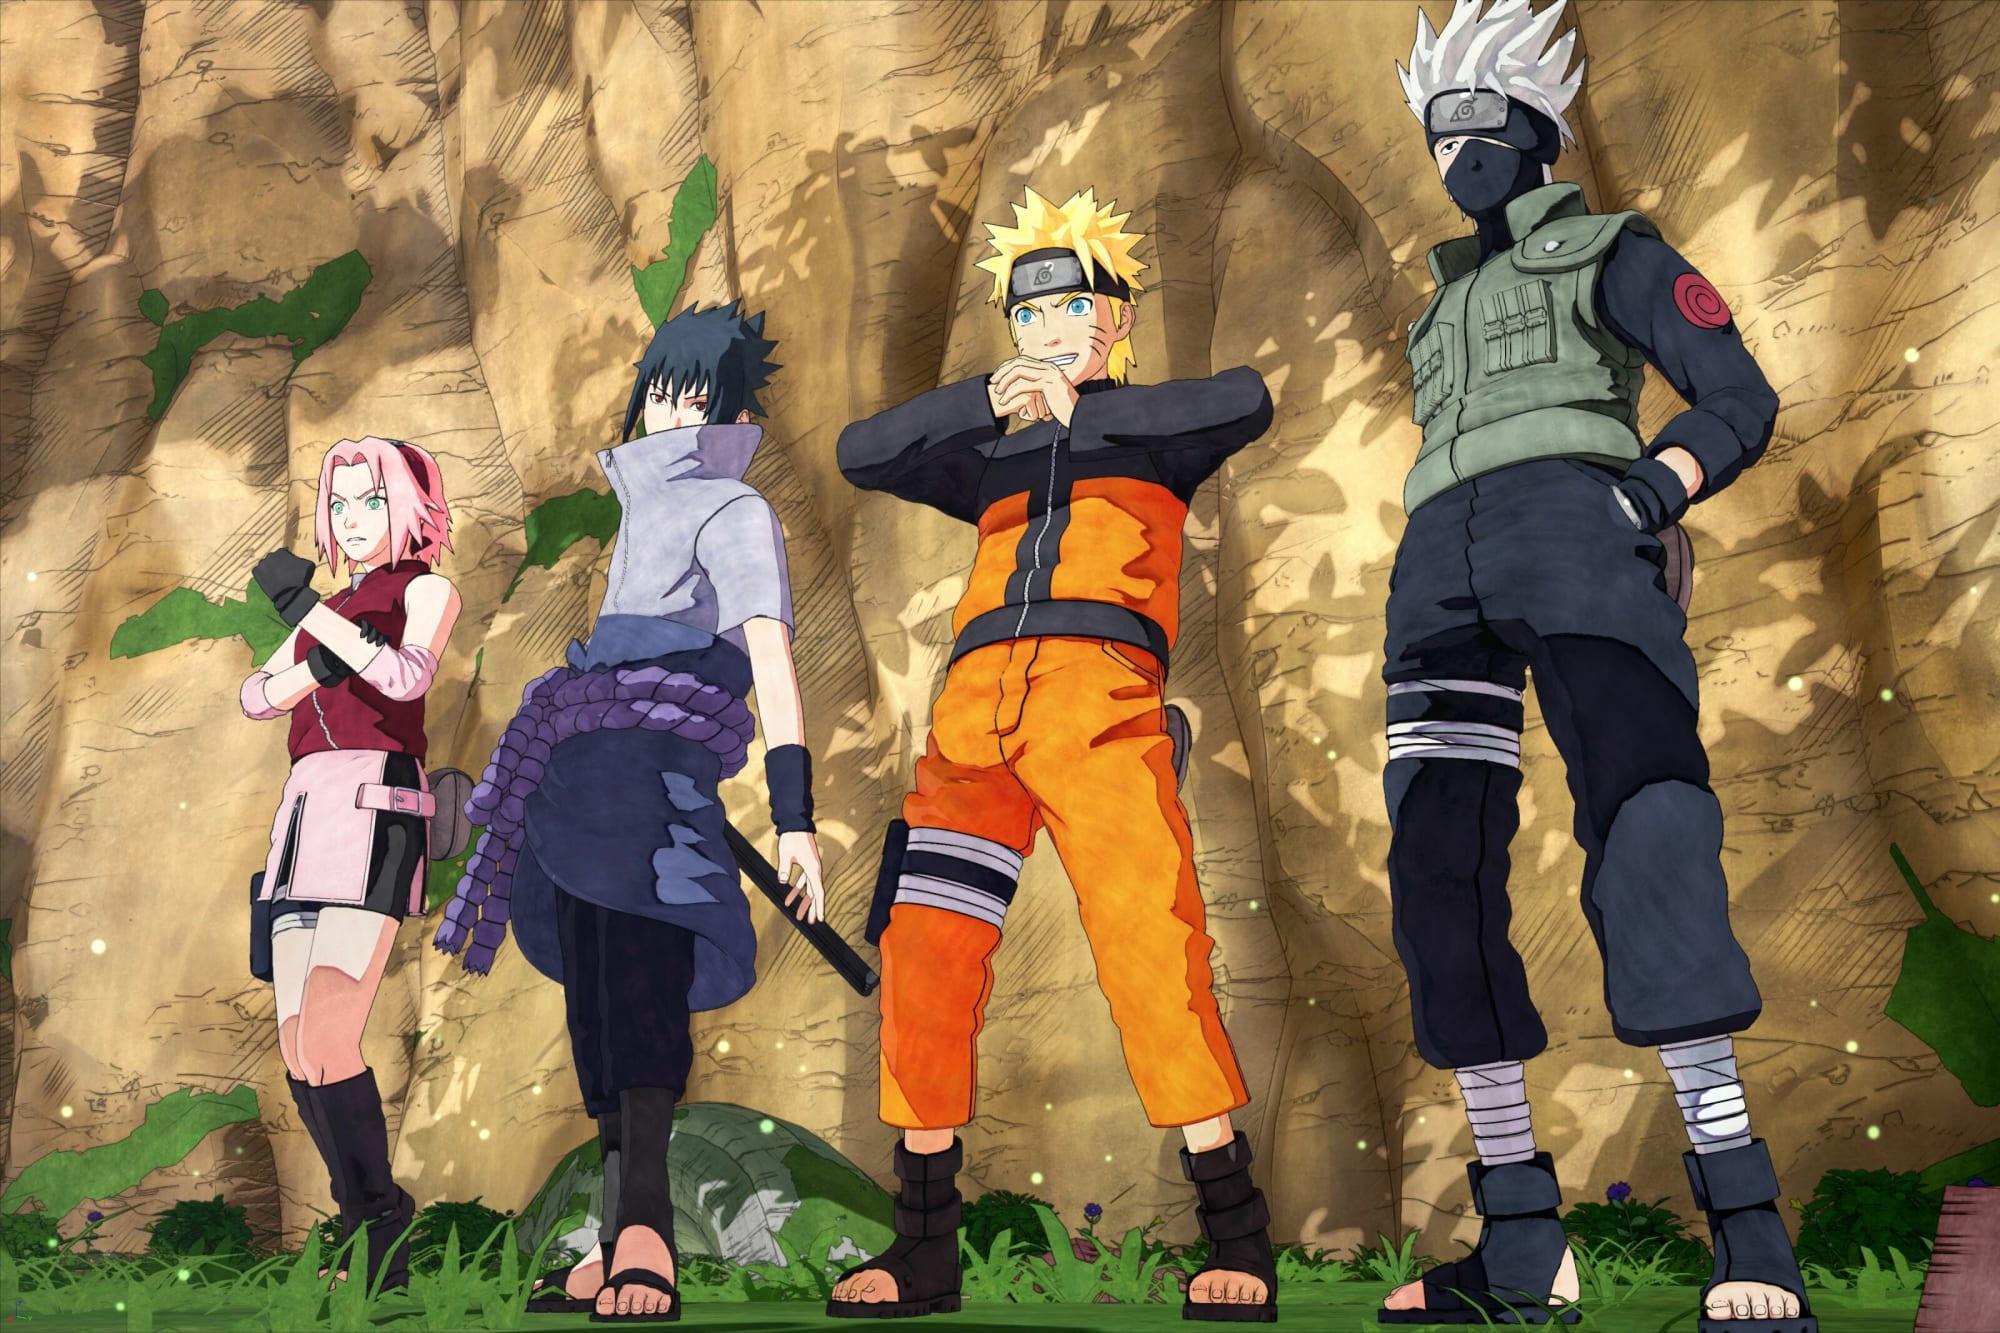 Naruto Fortnite crossover leaked for Season 8